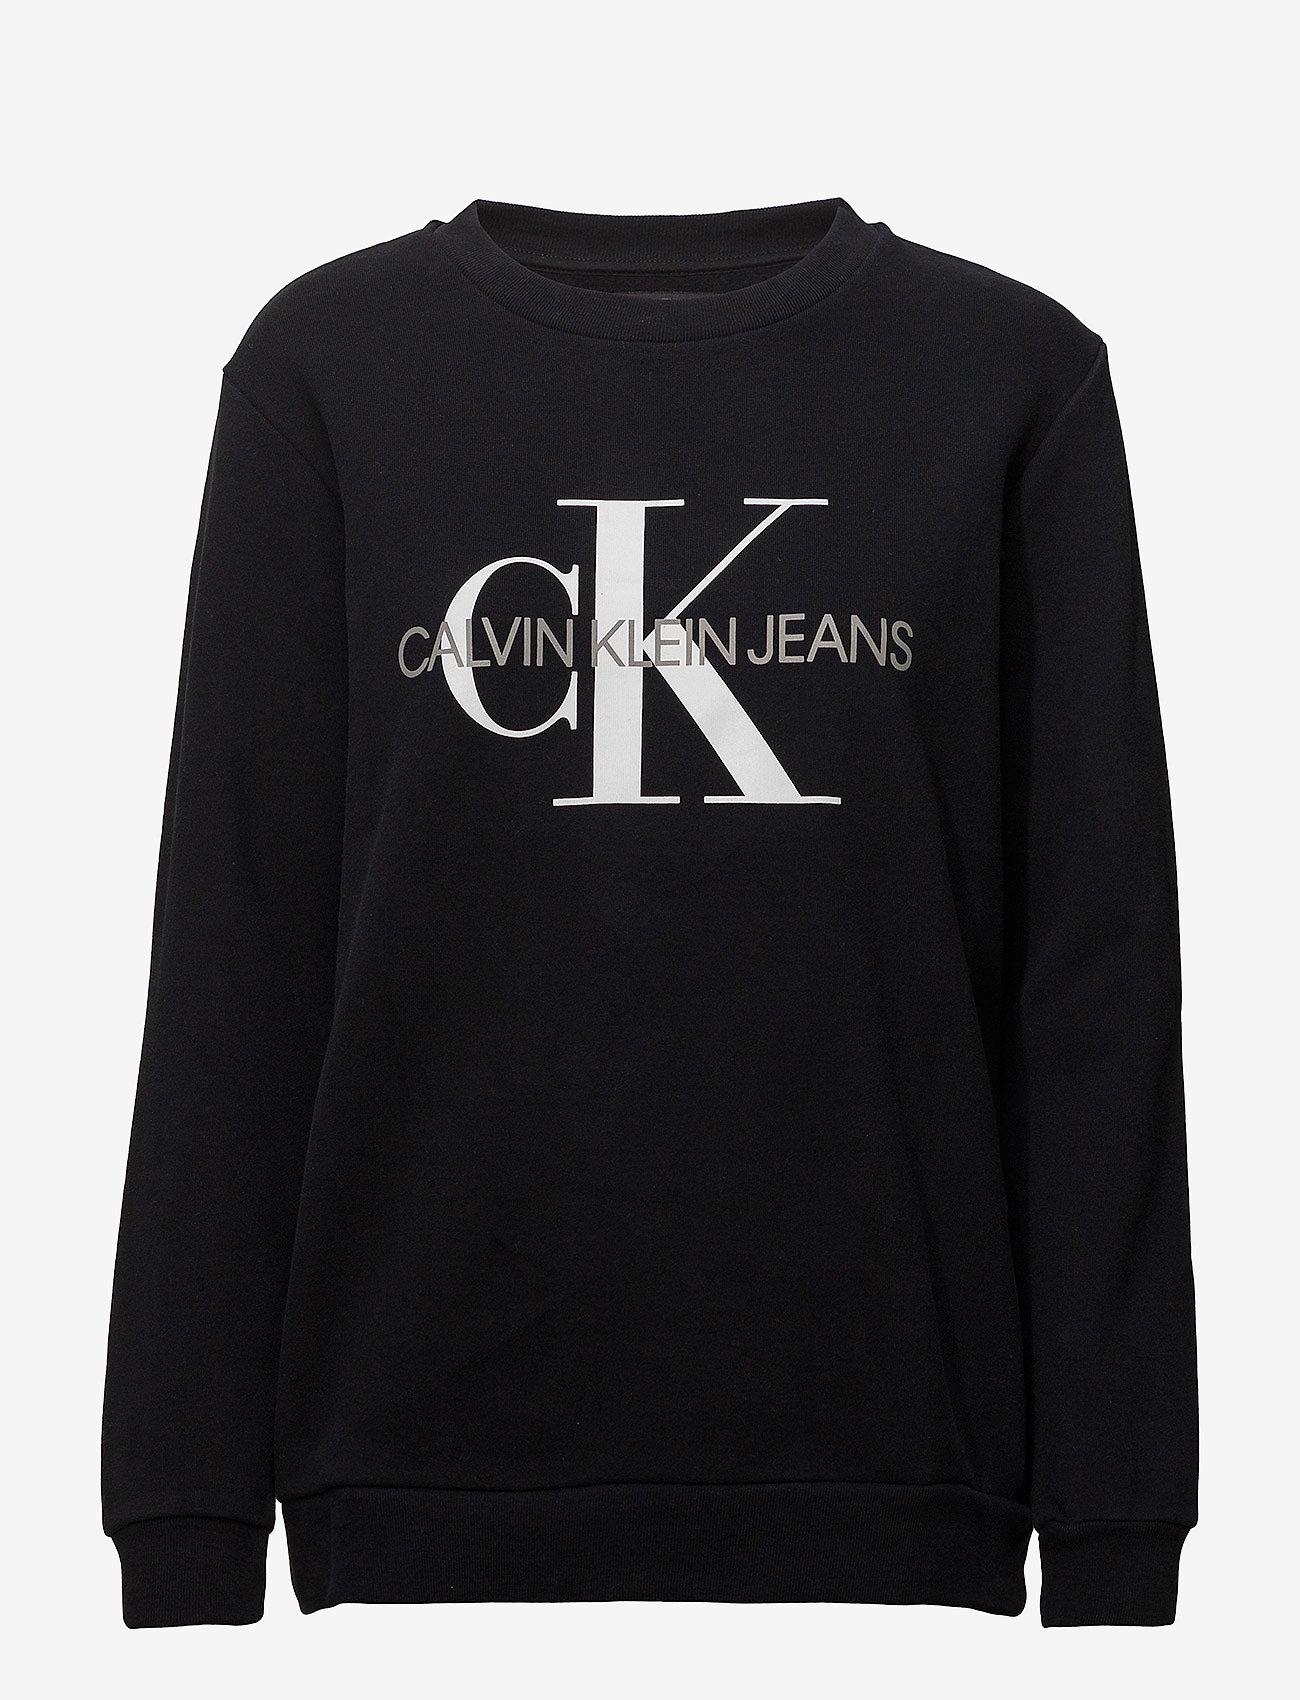 Calvin Klein Jeans - CORE MONOGRAM LOGO SWEATSHIRT - sweatshirts - ck black - 0